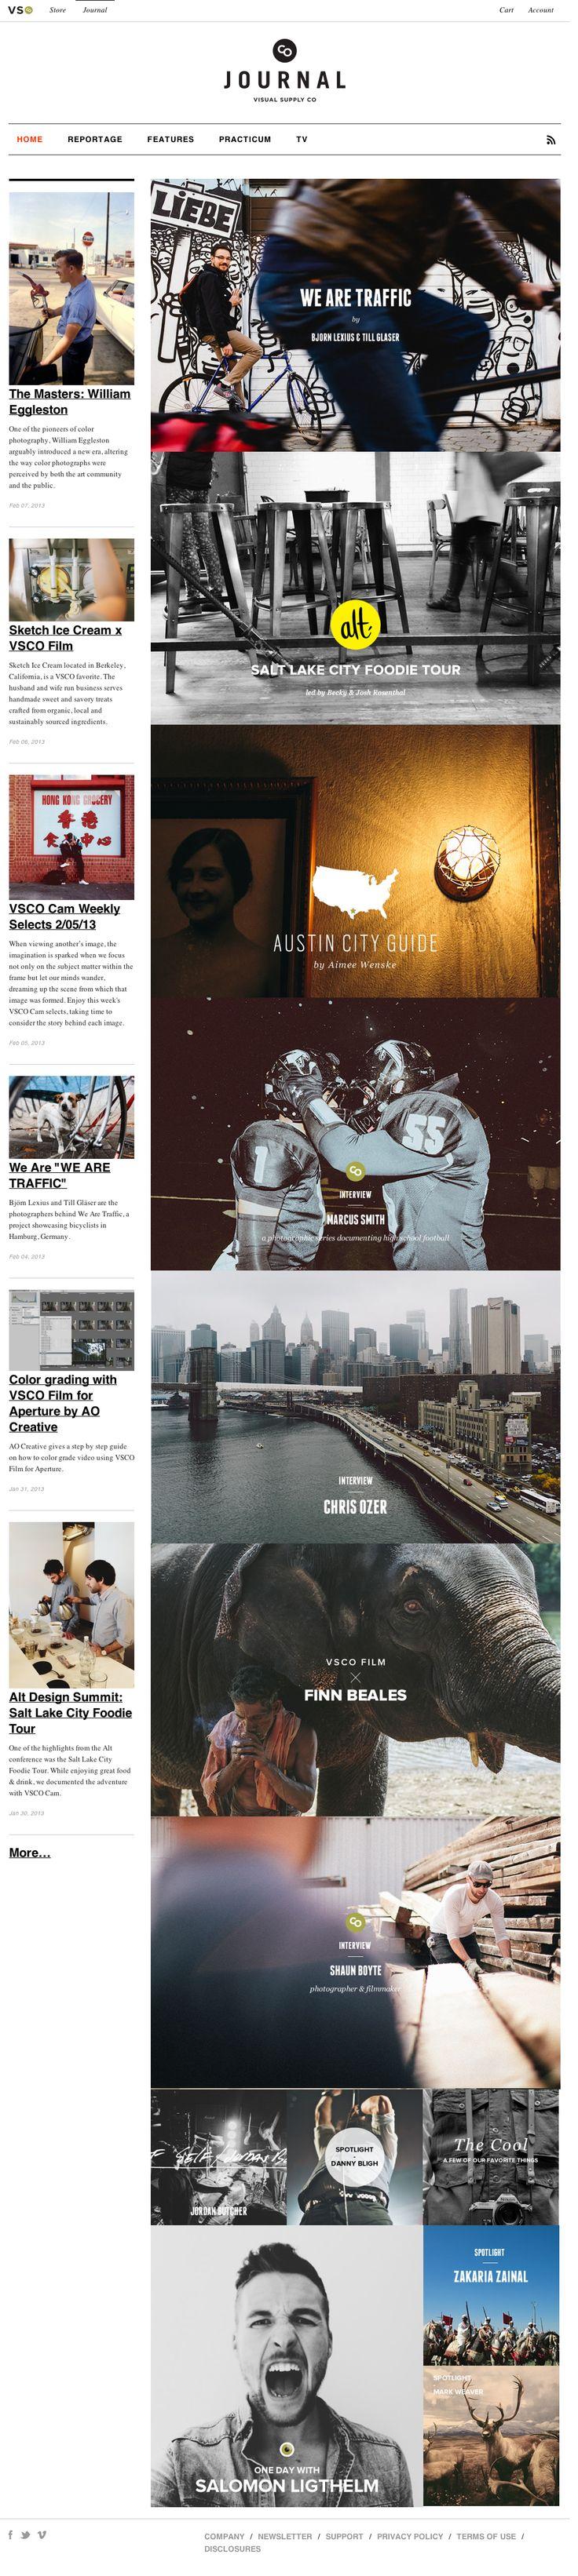 http://visualsupply.co/journal #webdesign